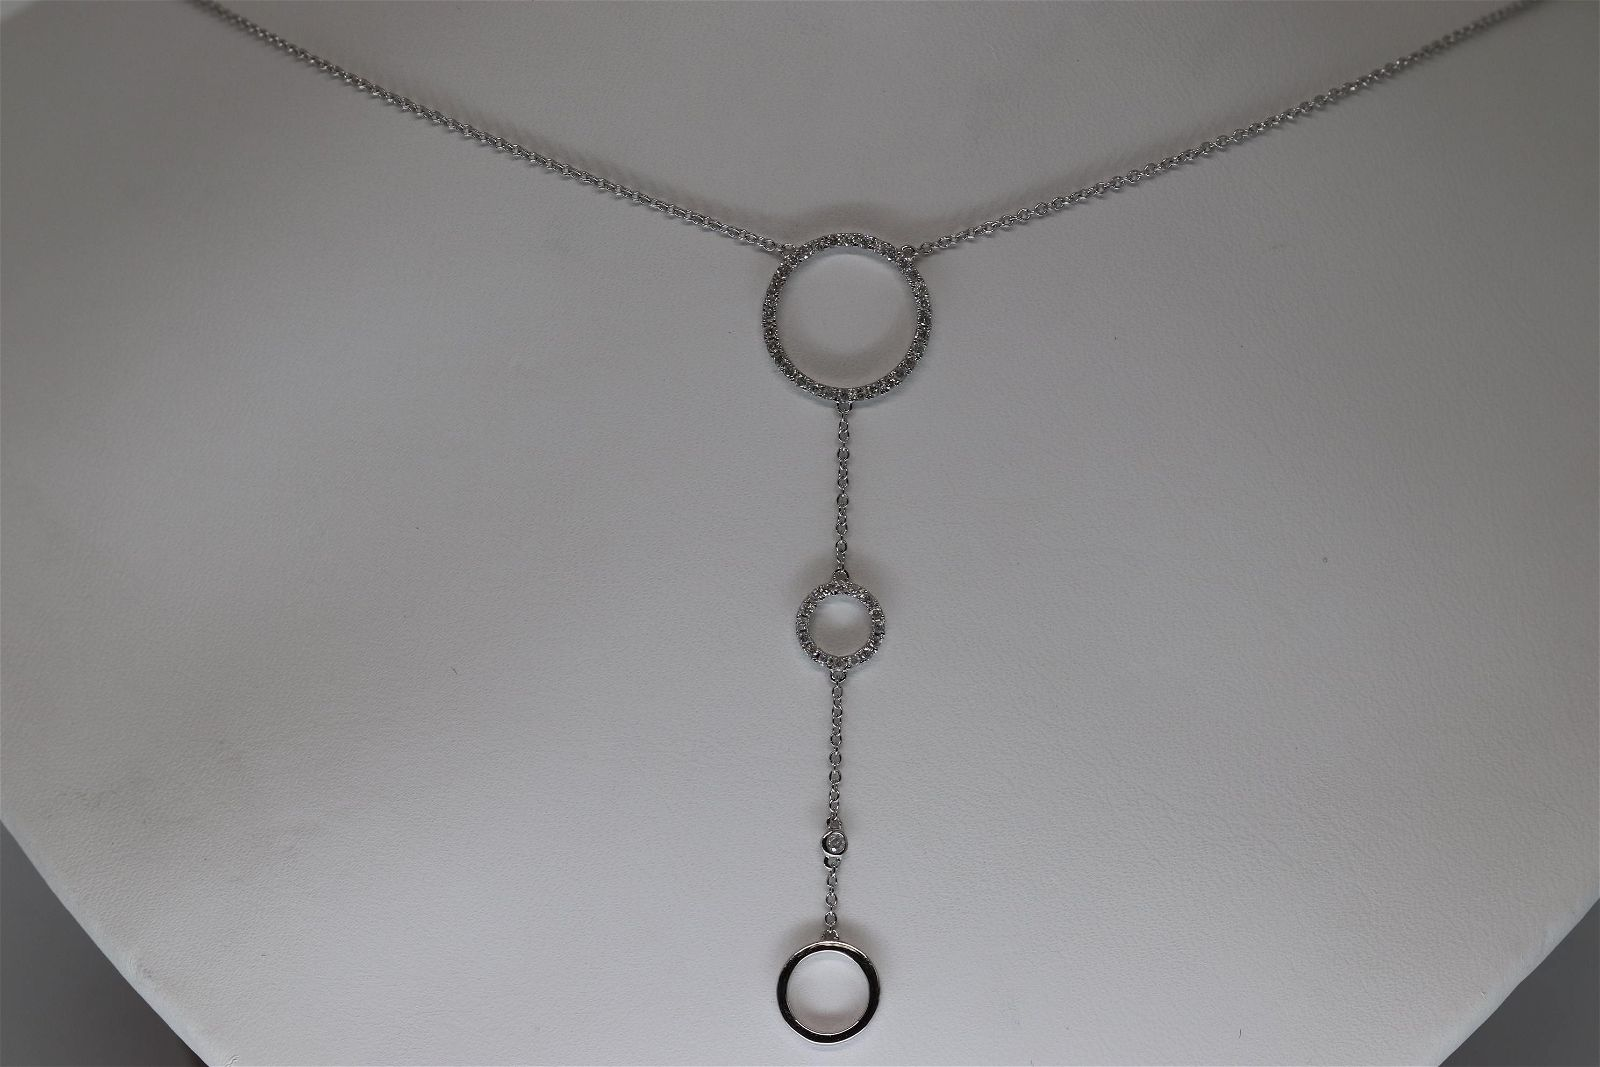 14kt Ladies Lariat Diamond Necklace